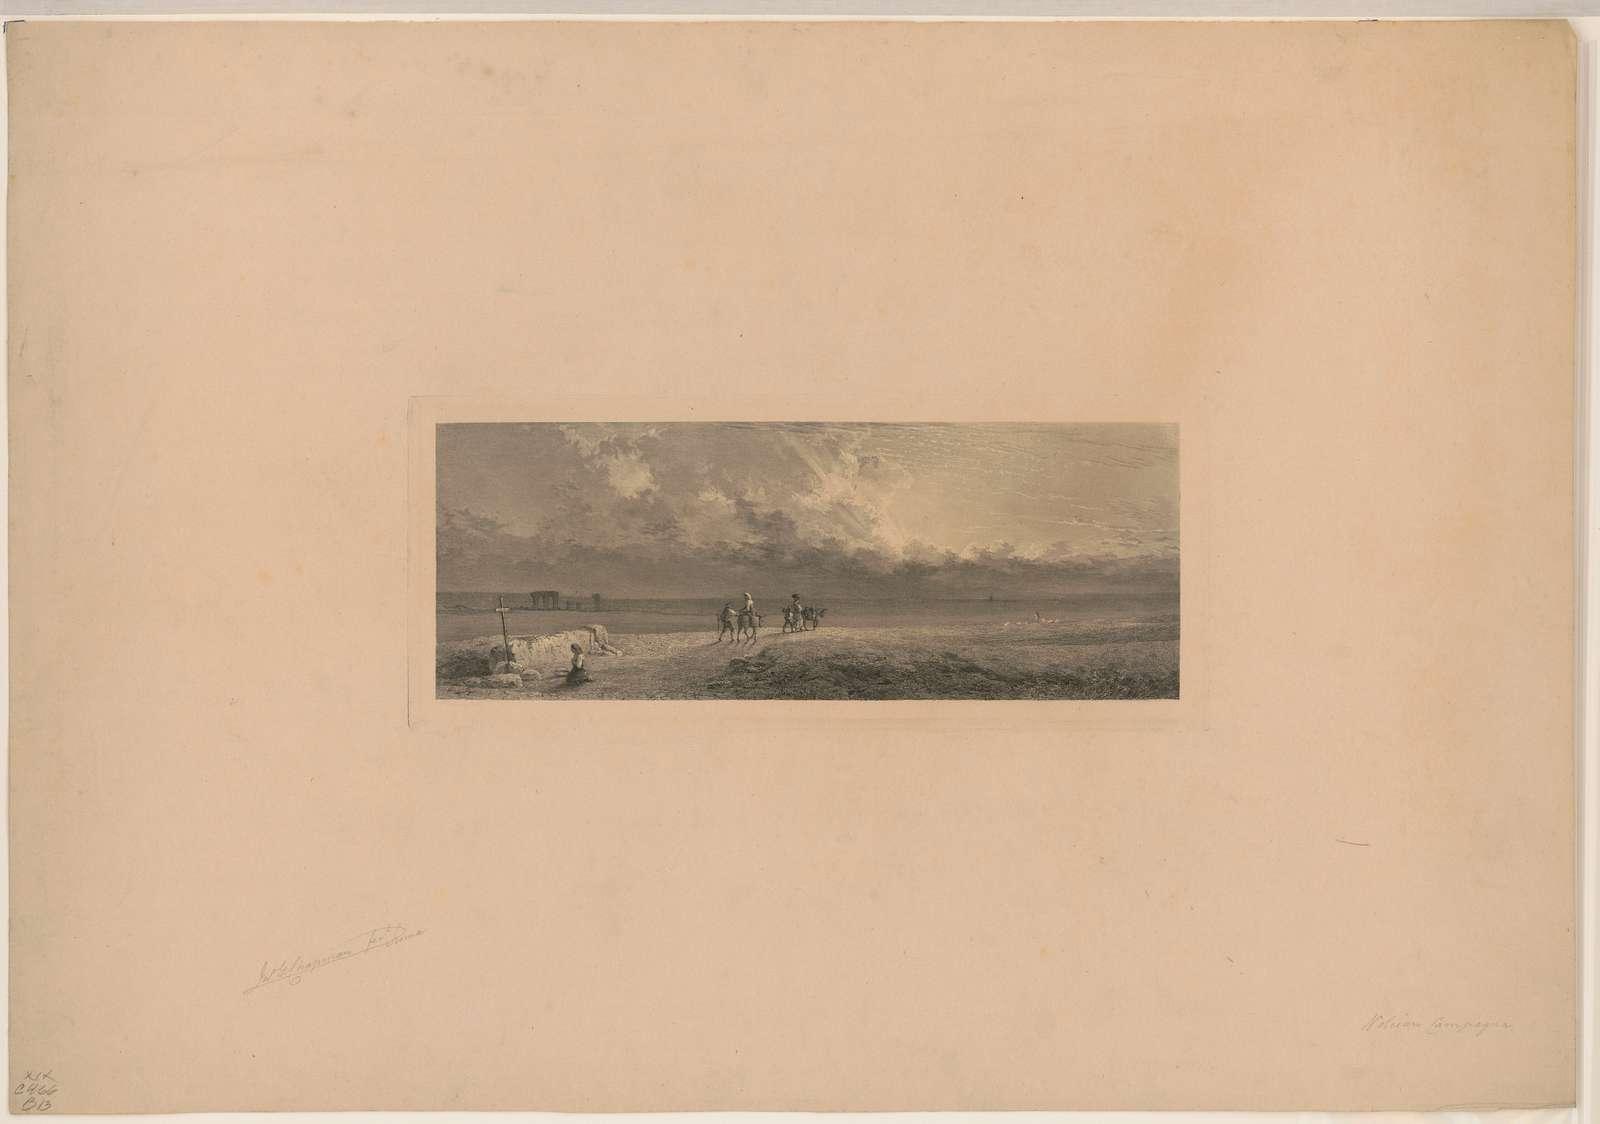 Volcian Campagna / Jno. G. Chapman, fect. Roma.